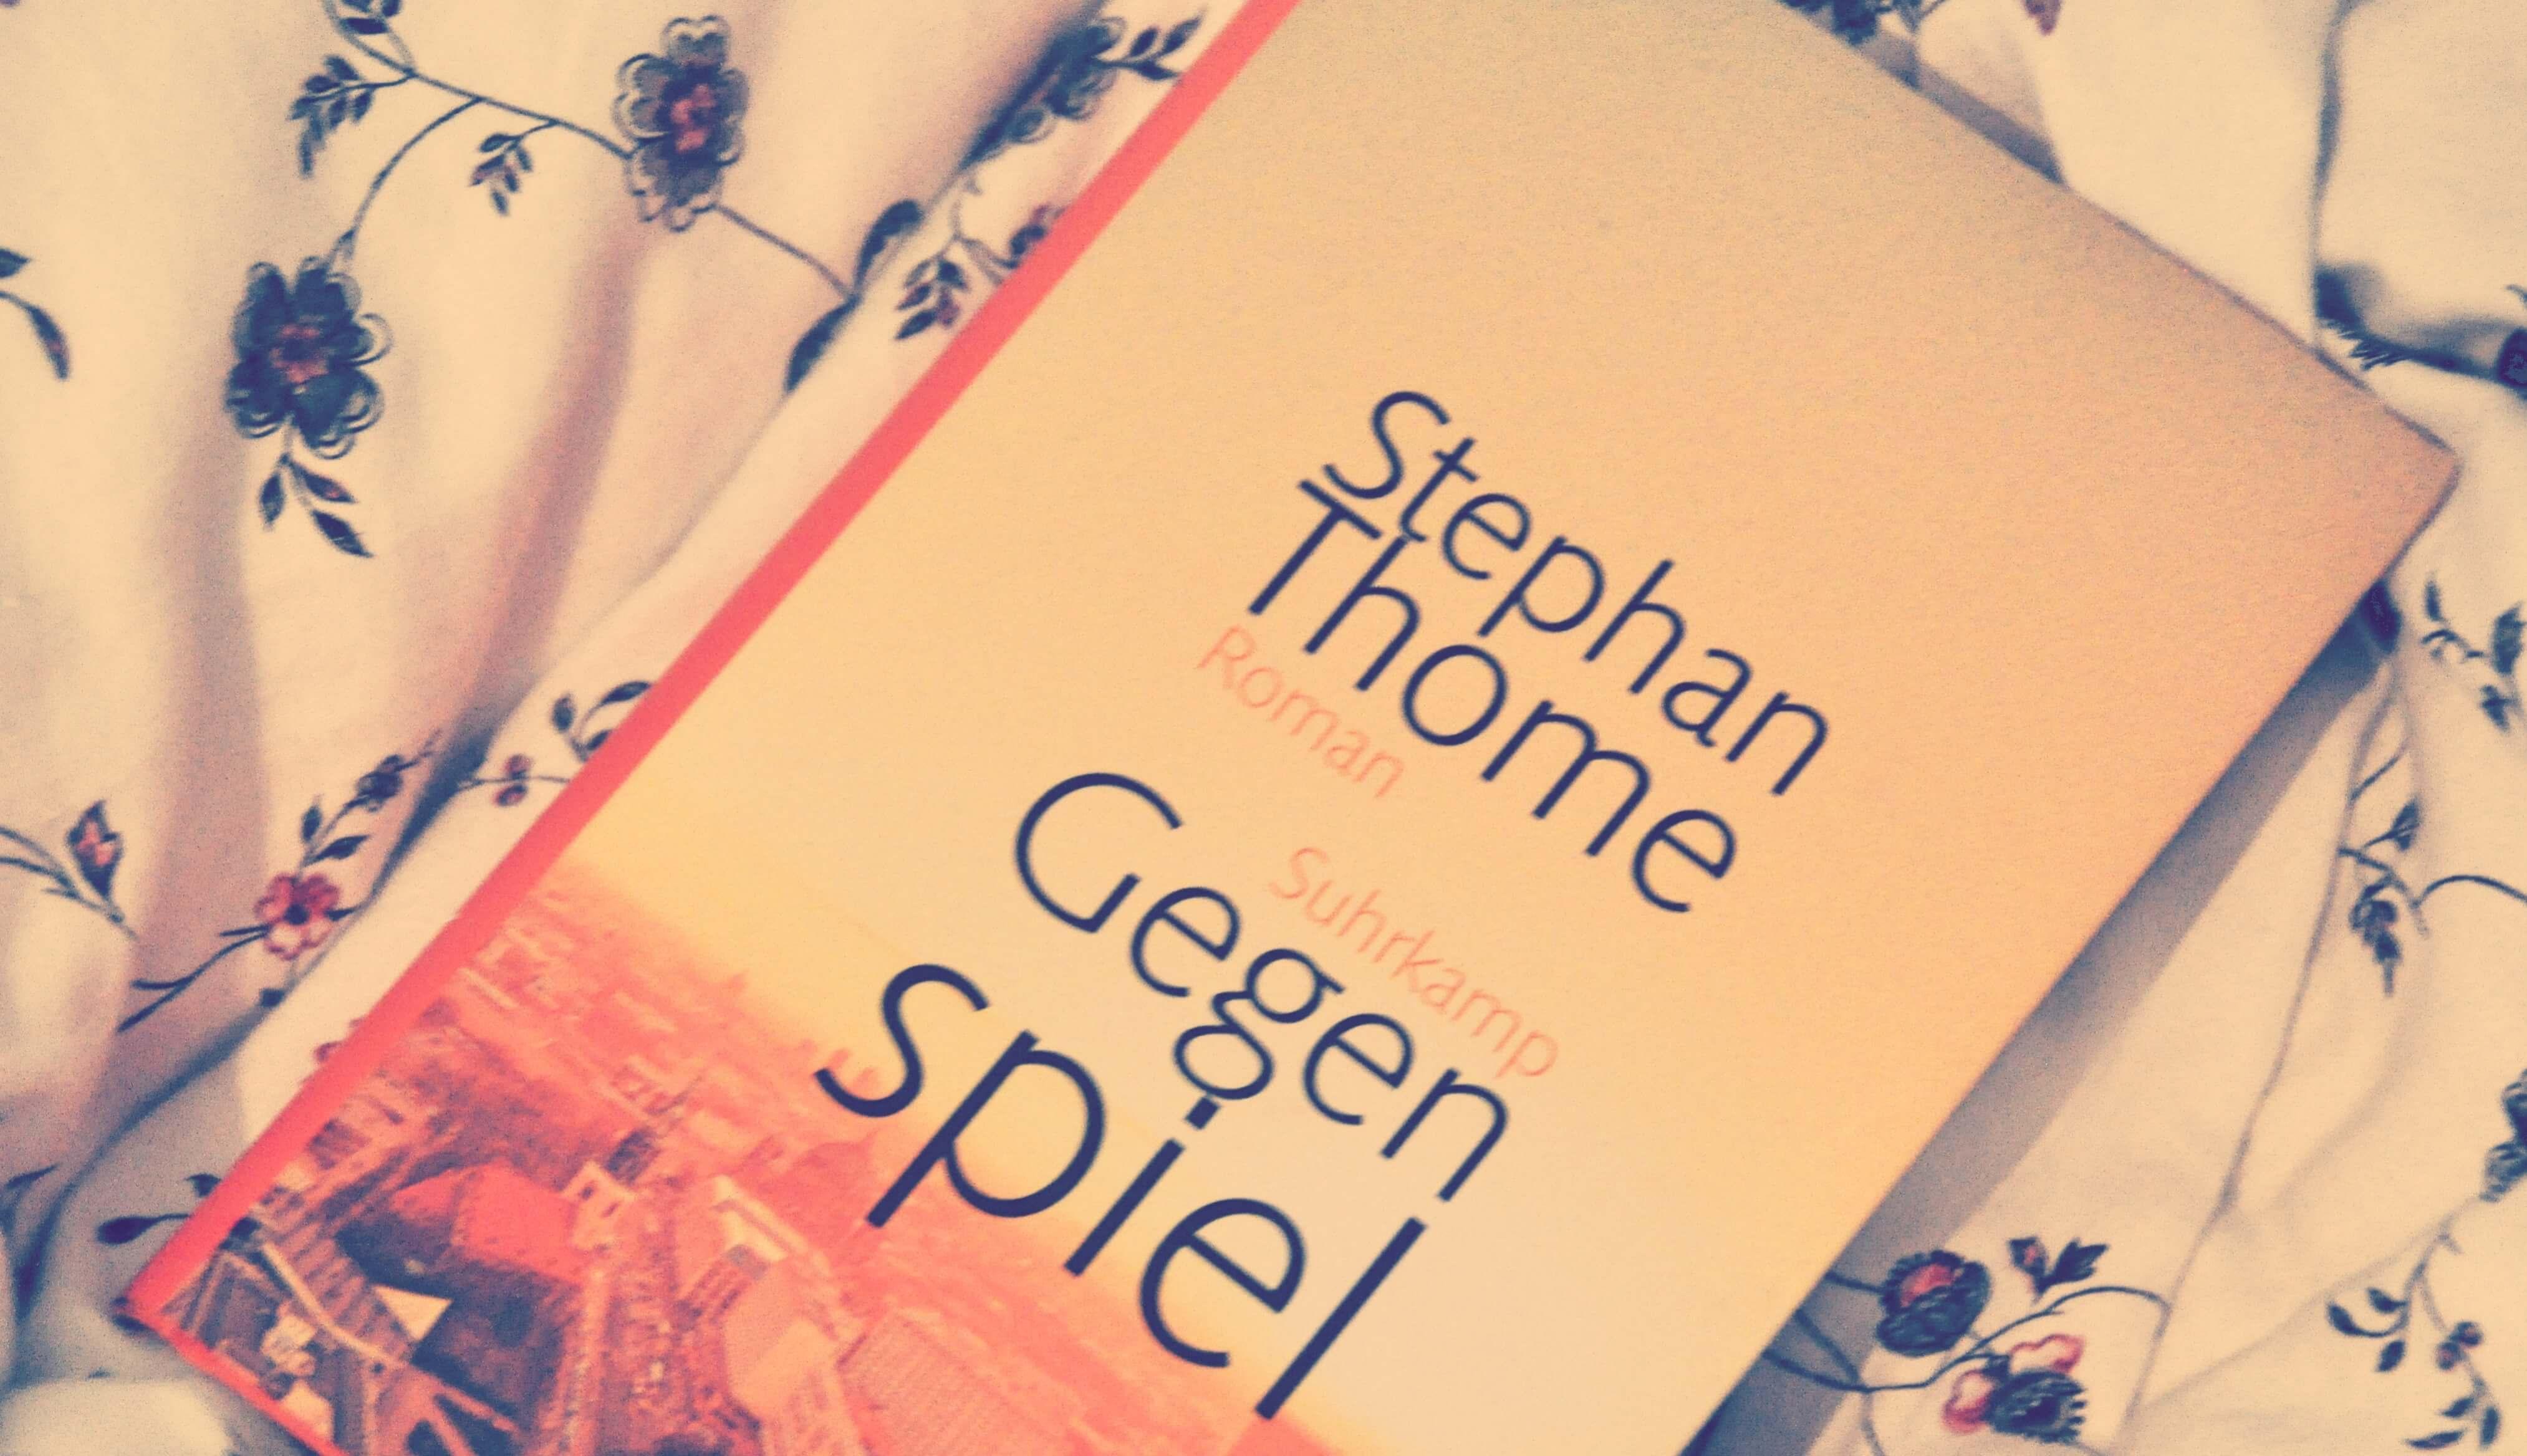 Stephan Thome Gegenspiel